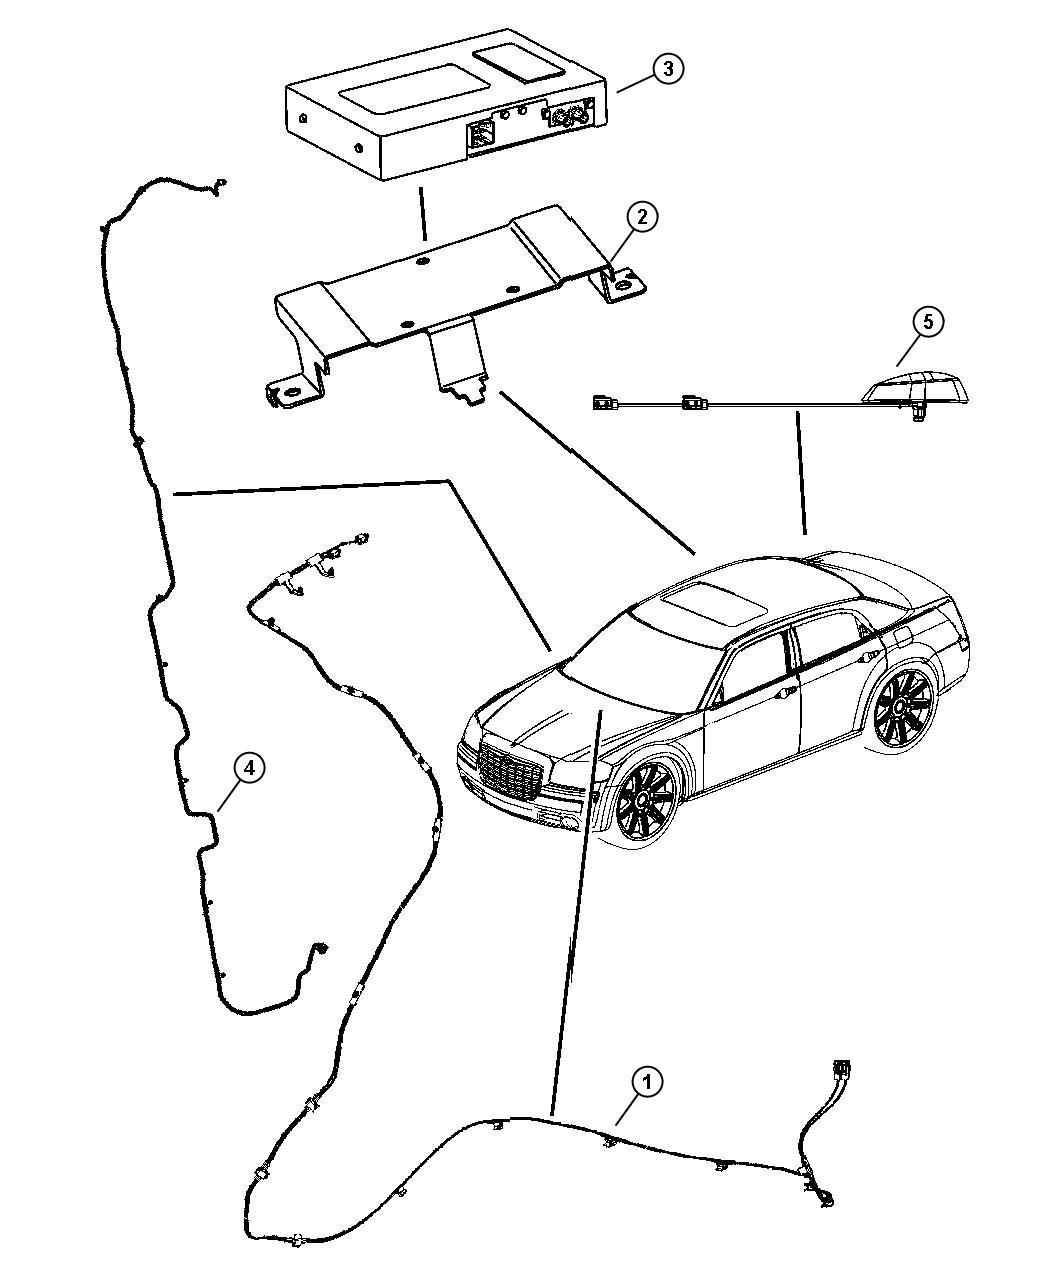 07 Dodge Ram Radio Wiring Diagram